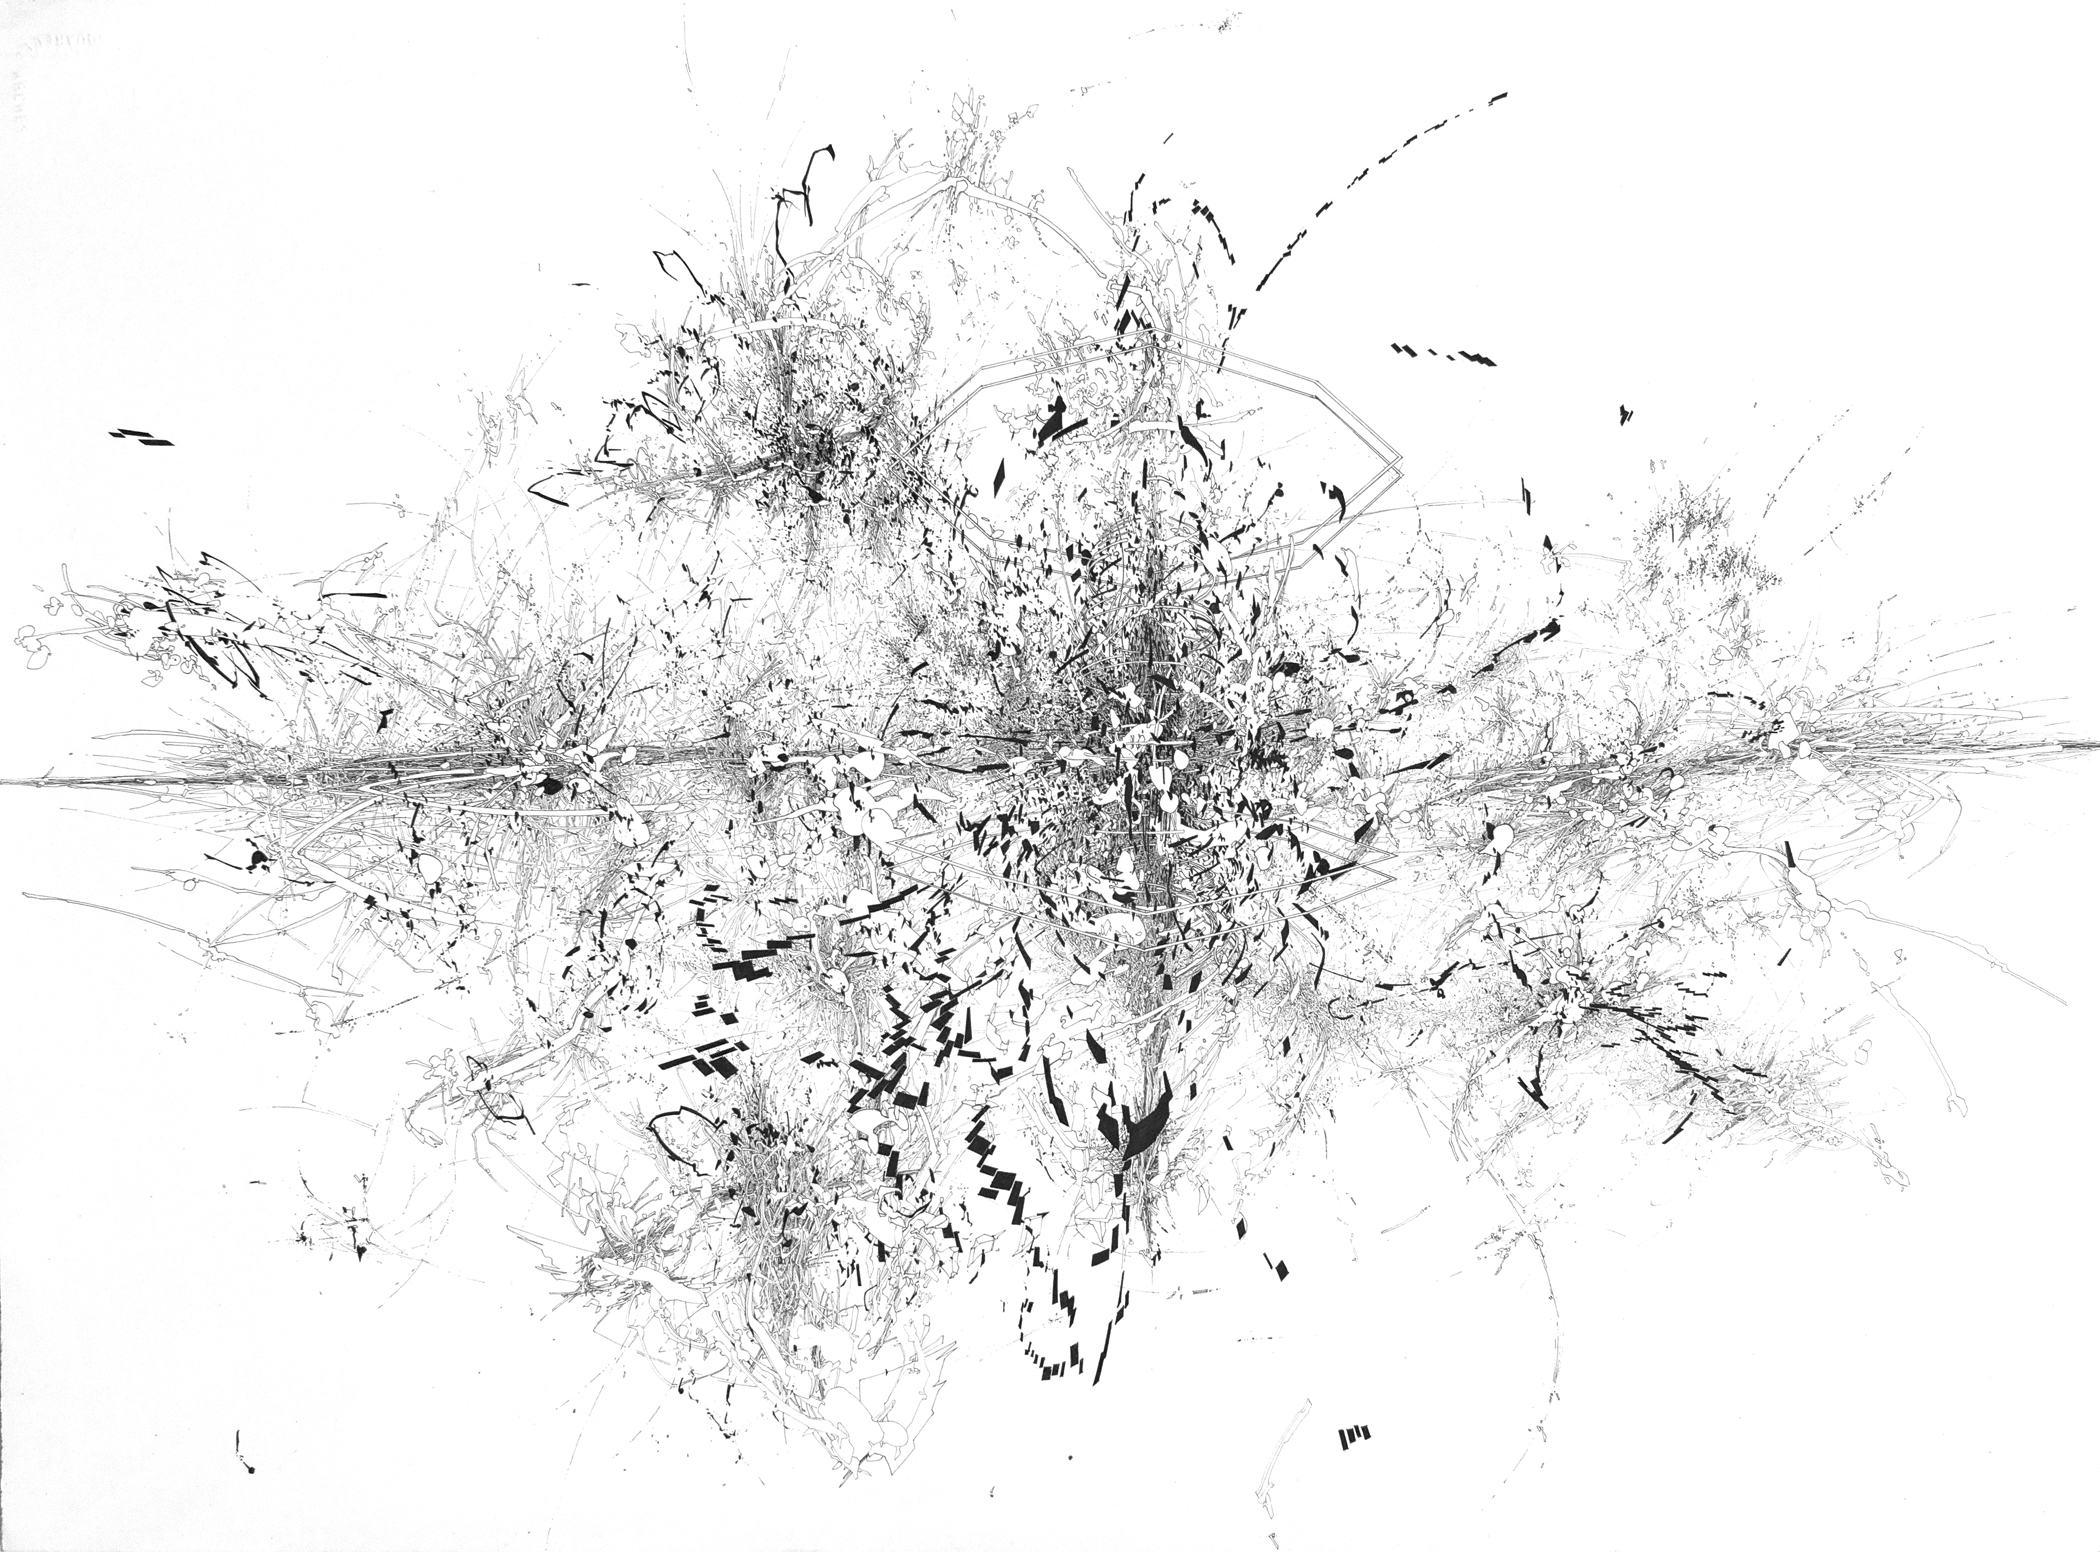 LHC Drawing